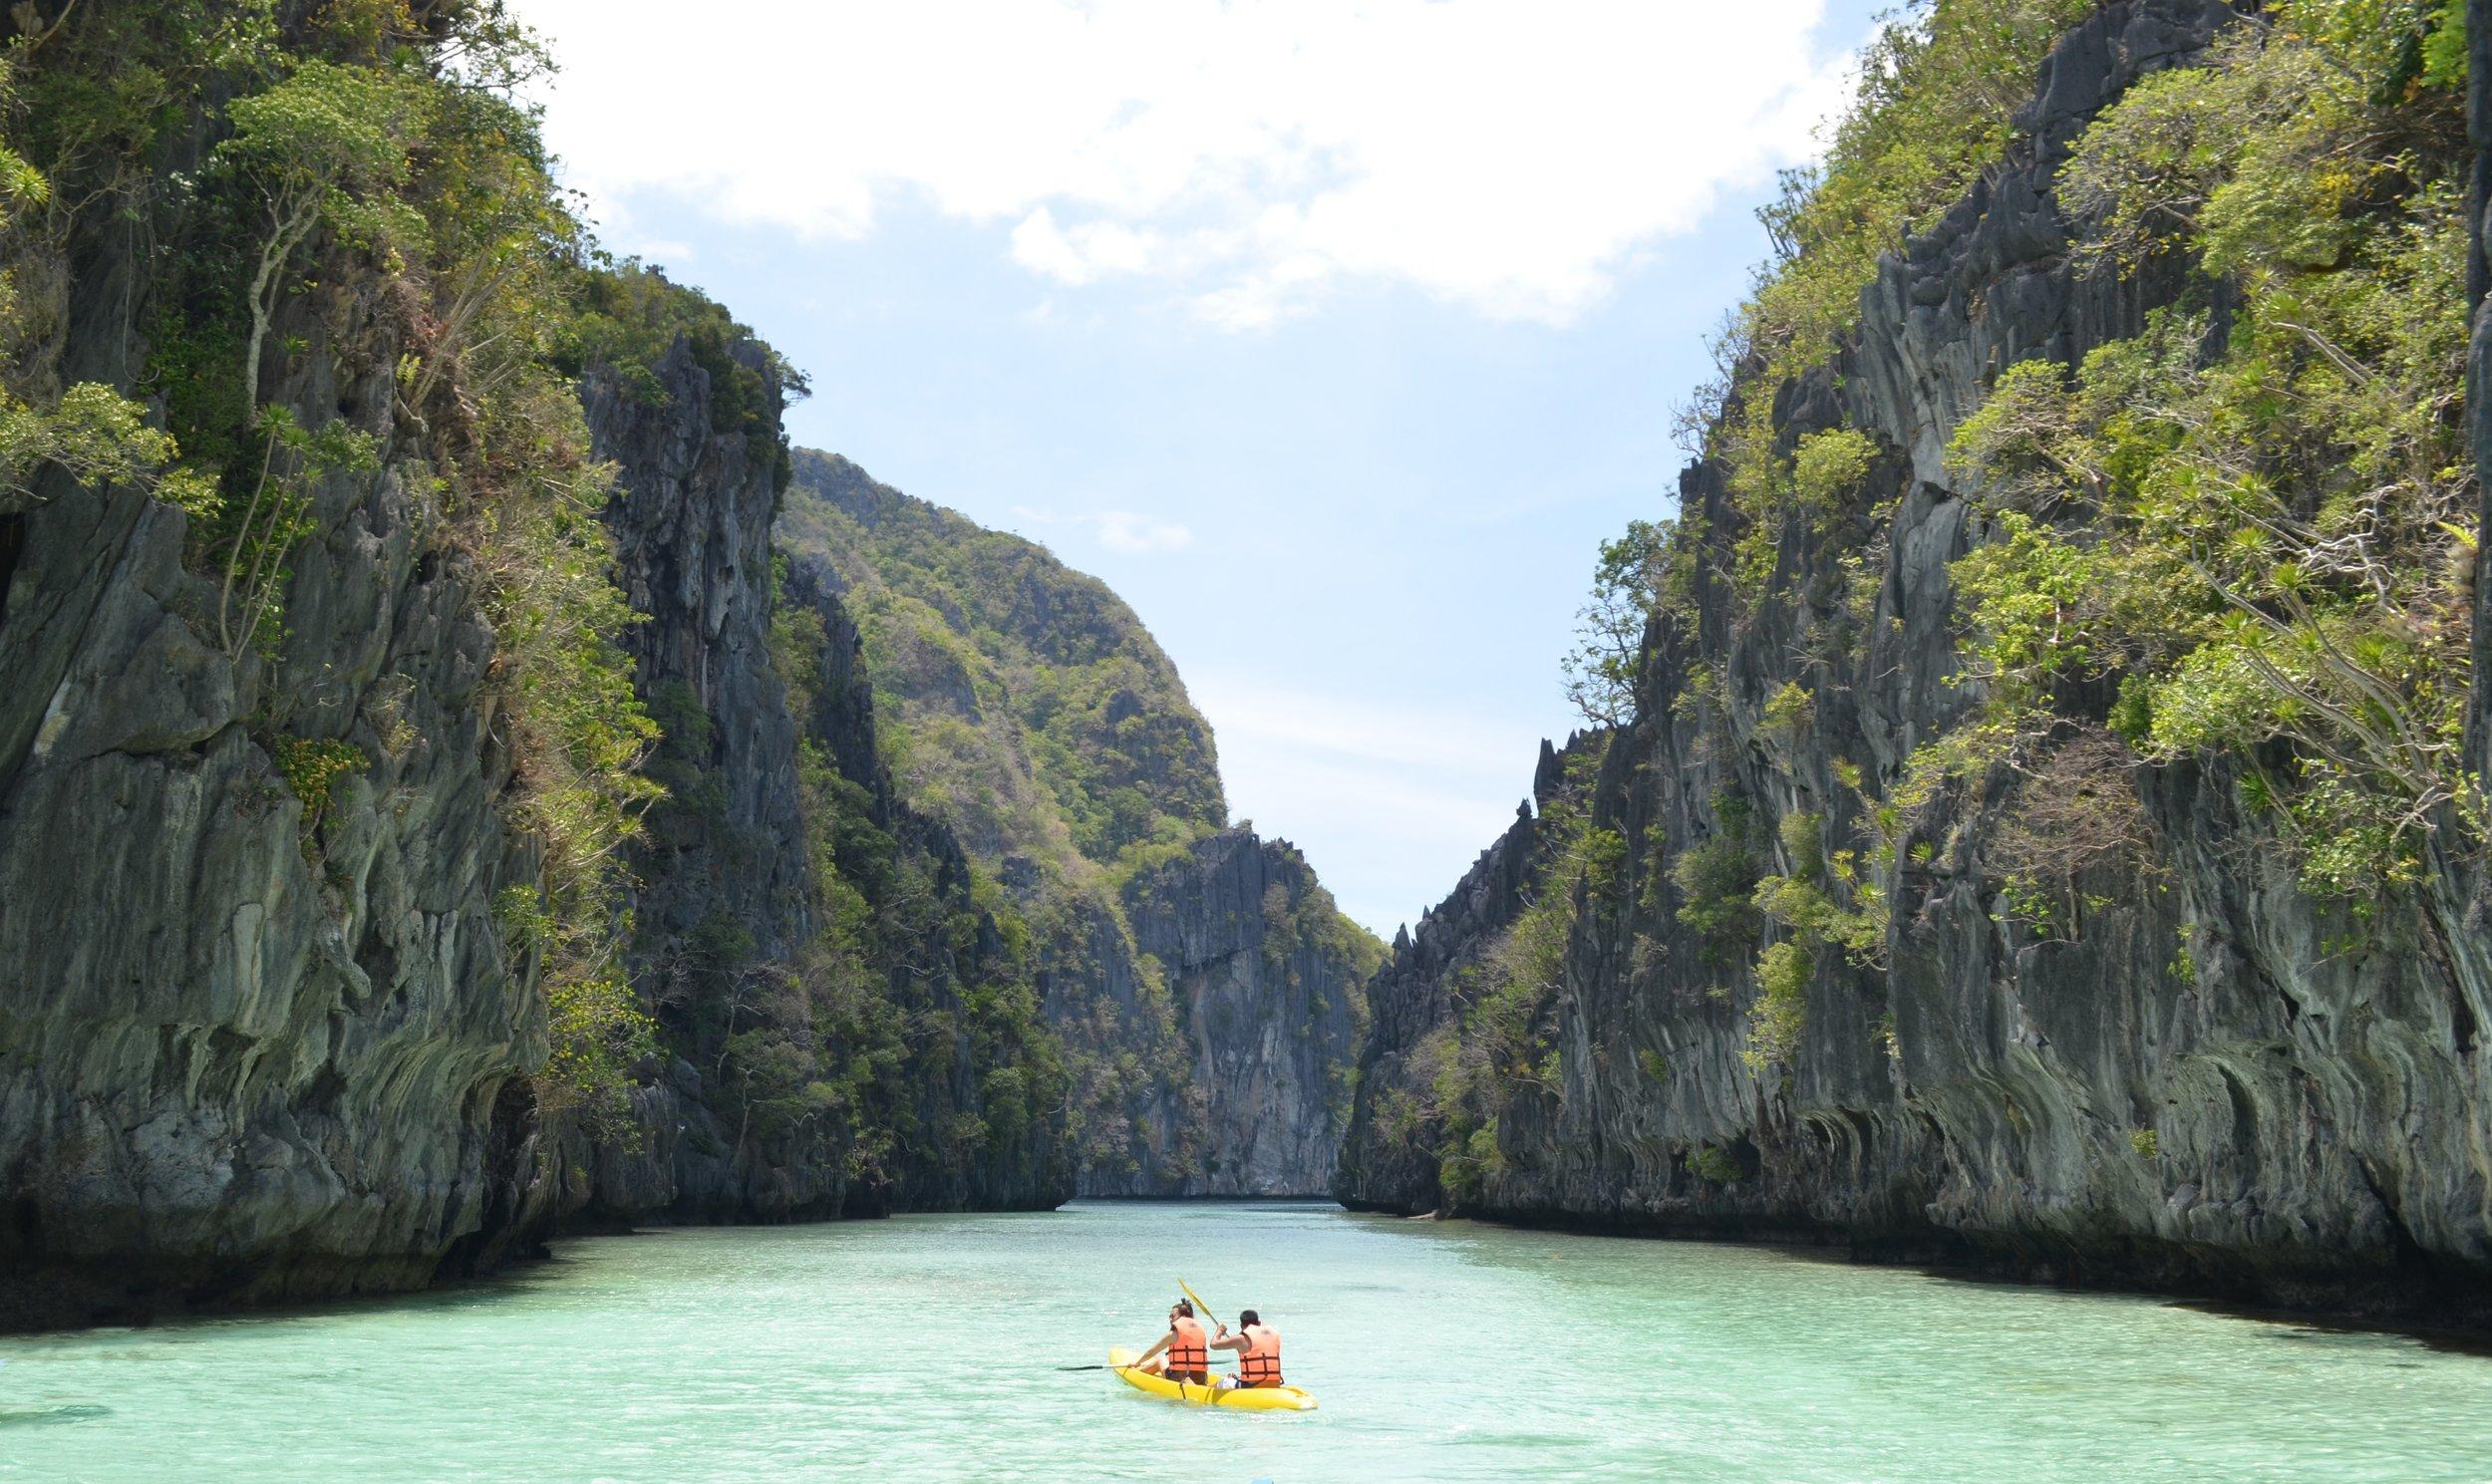 Entering Big Lagoon in El Nido, Palawan. Photo by Ehmir Bautista.